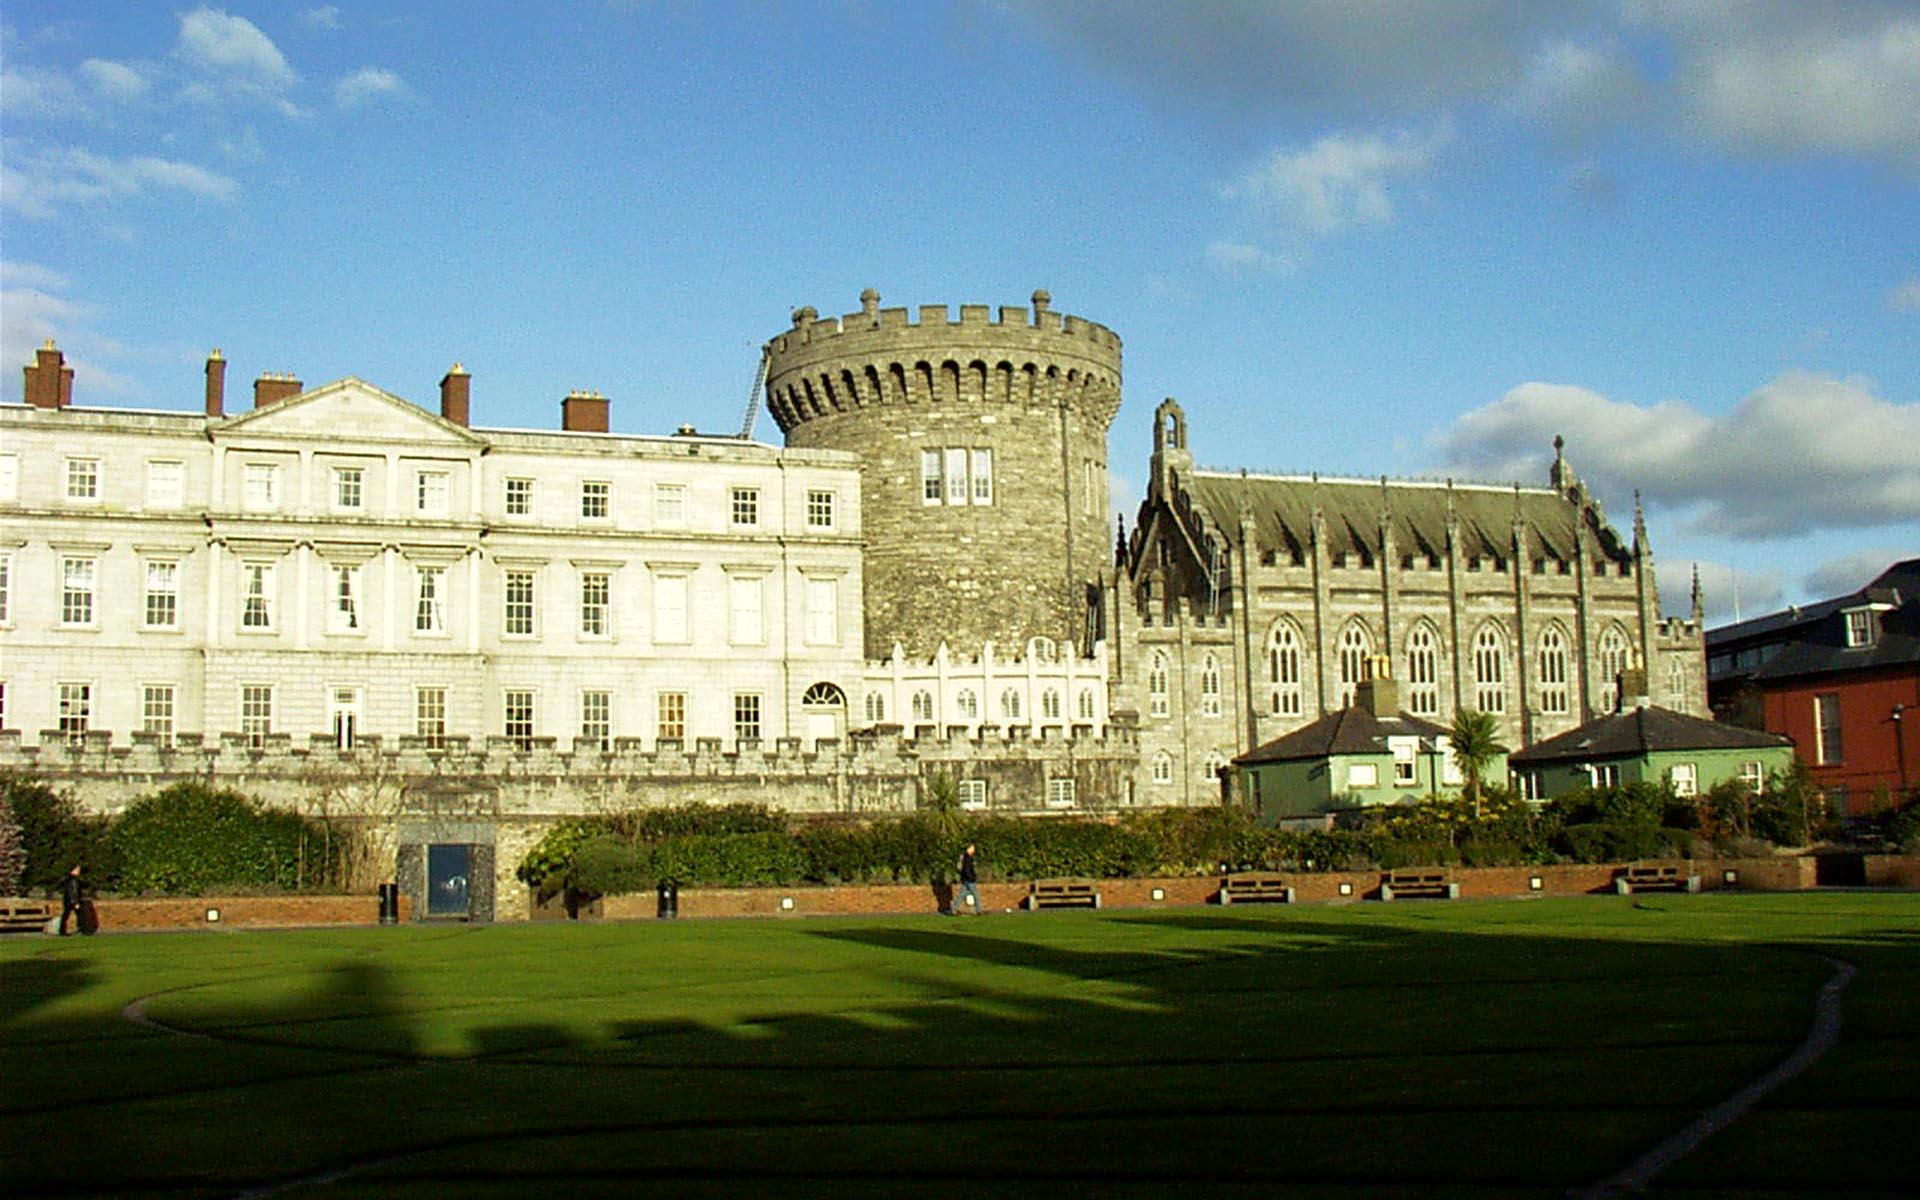 castle dublin ireland wallpaper 1920x1200 1920x1200